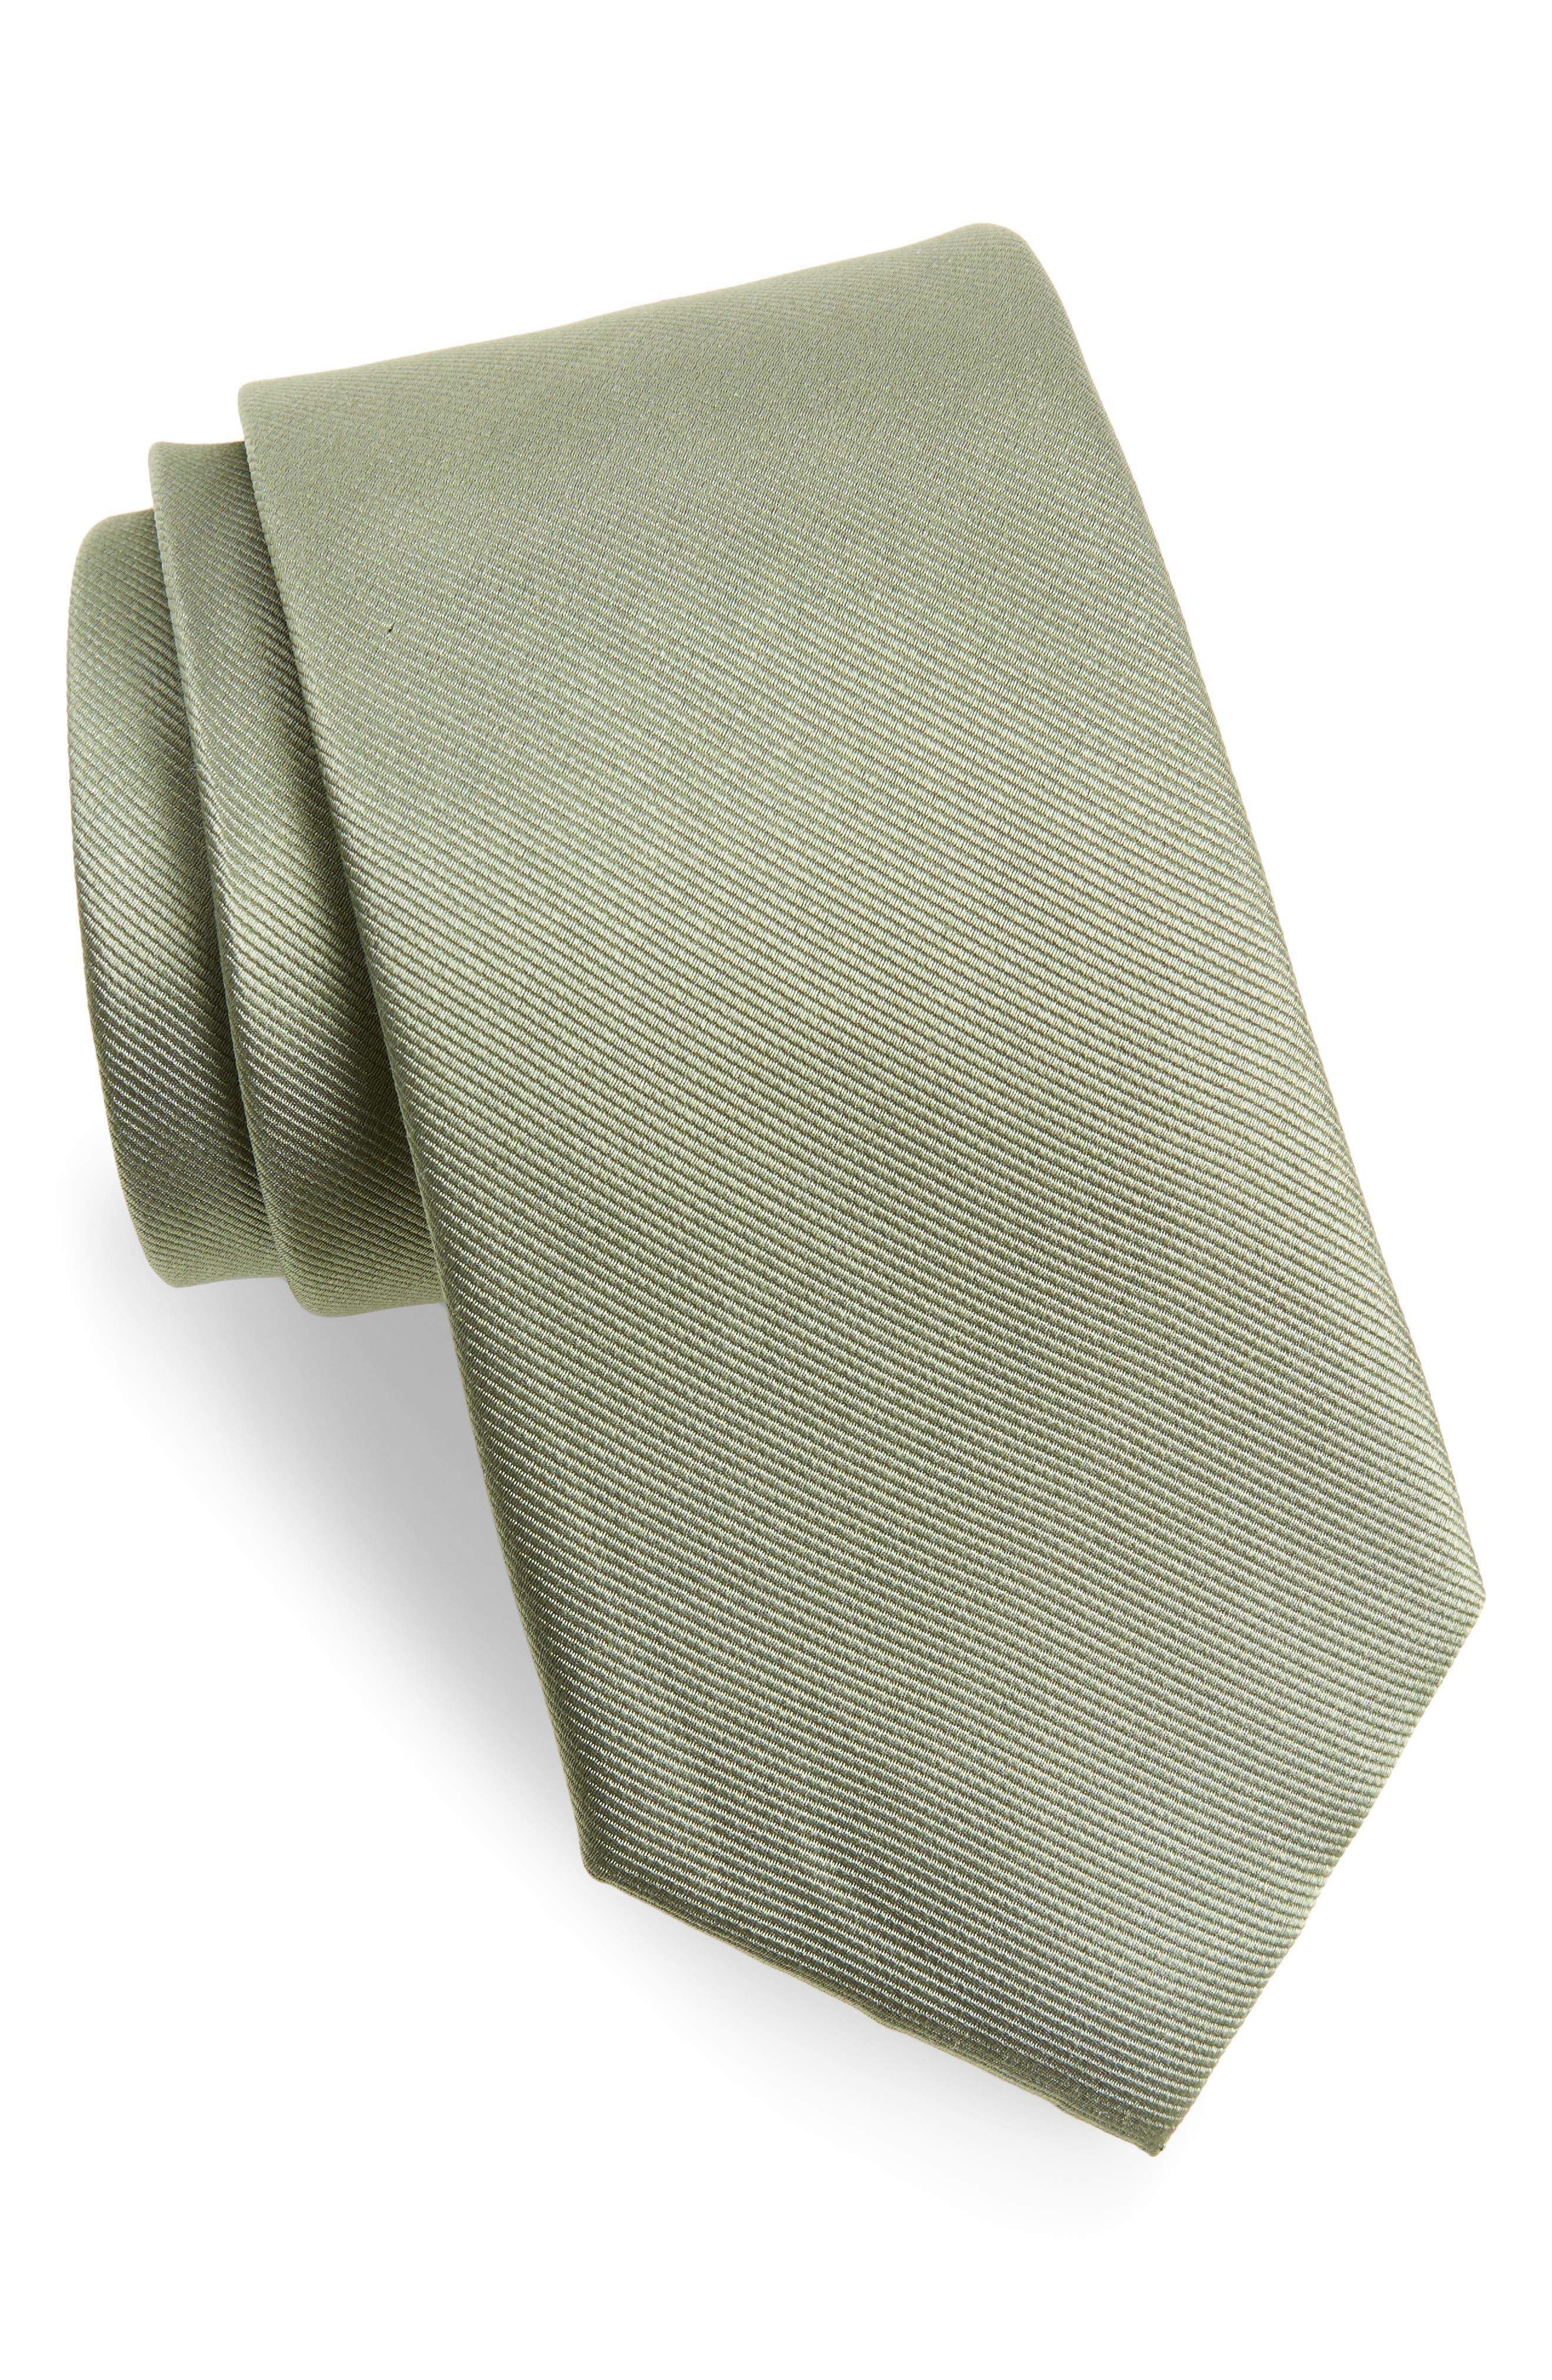 Main Image - The Tie Bar Solid Silk Tie (X-Long)